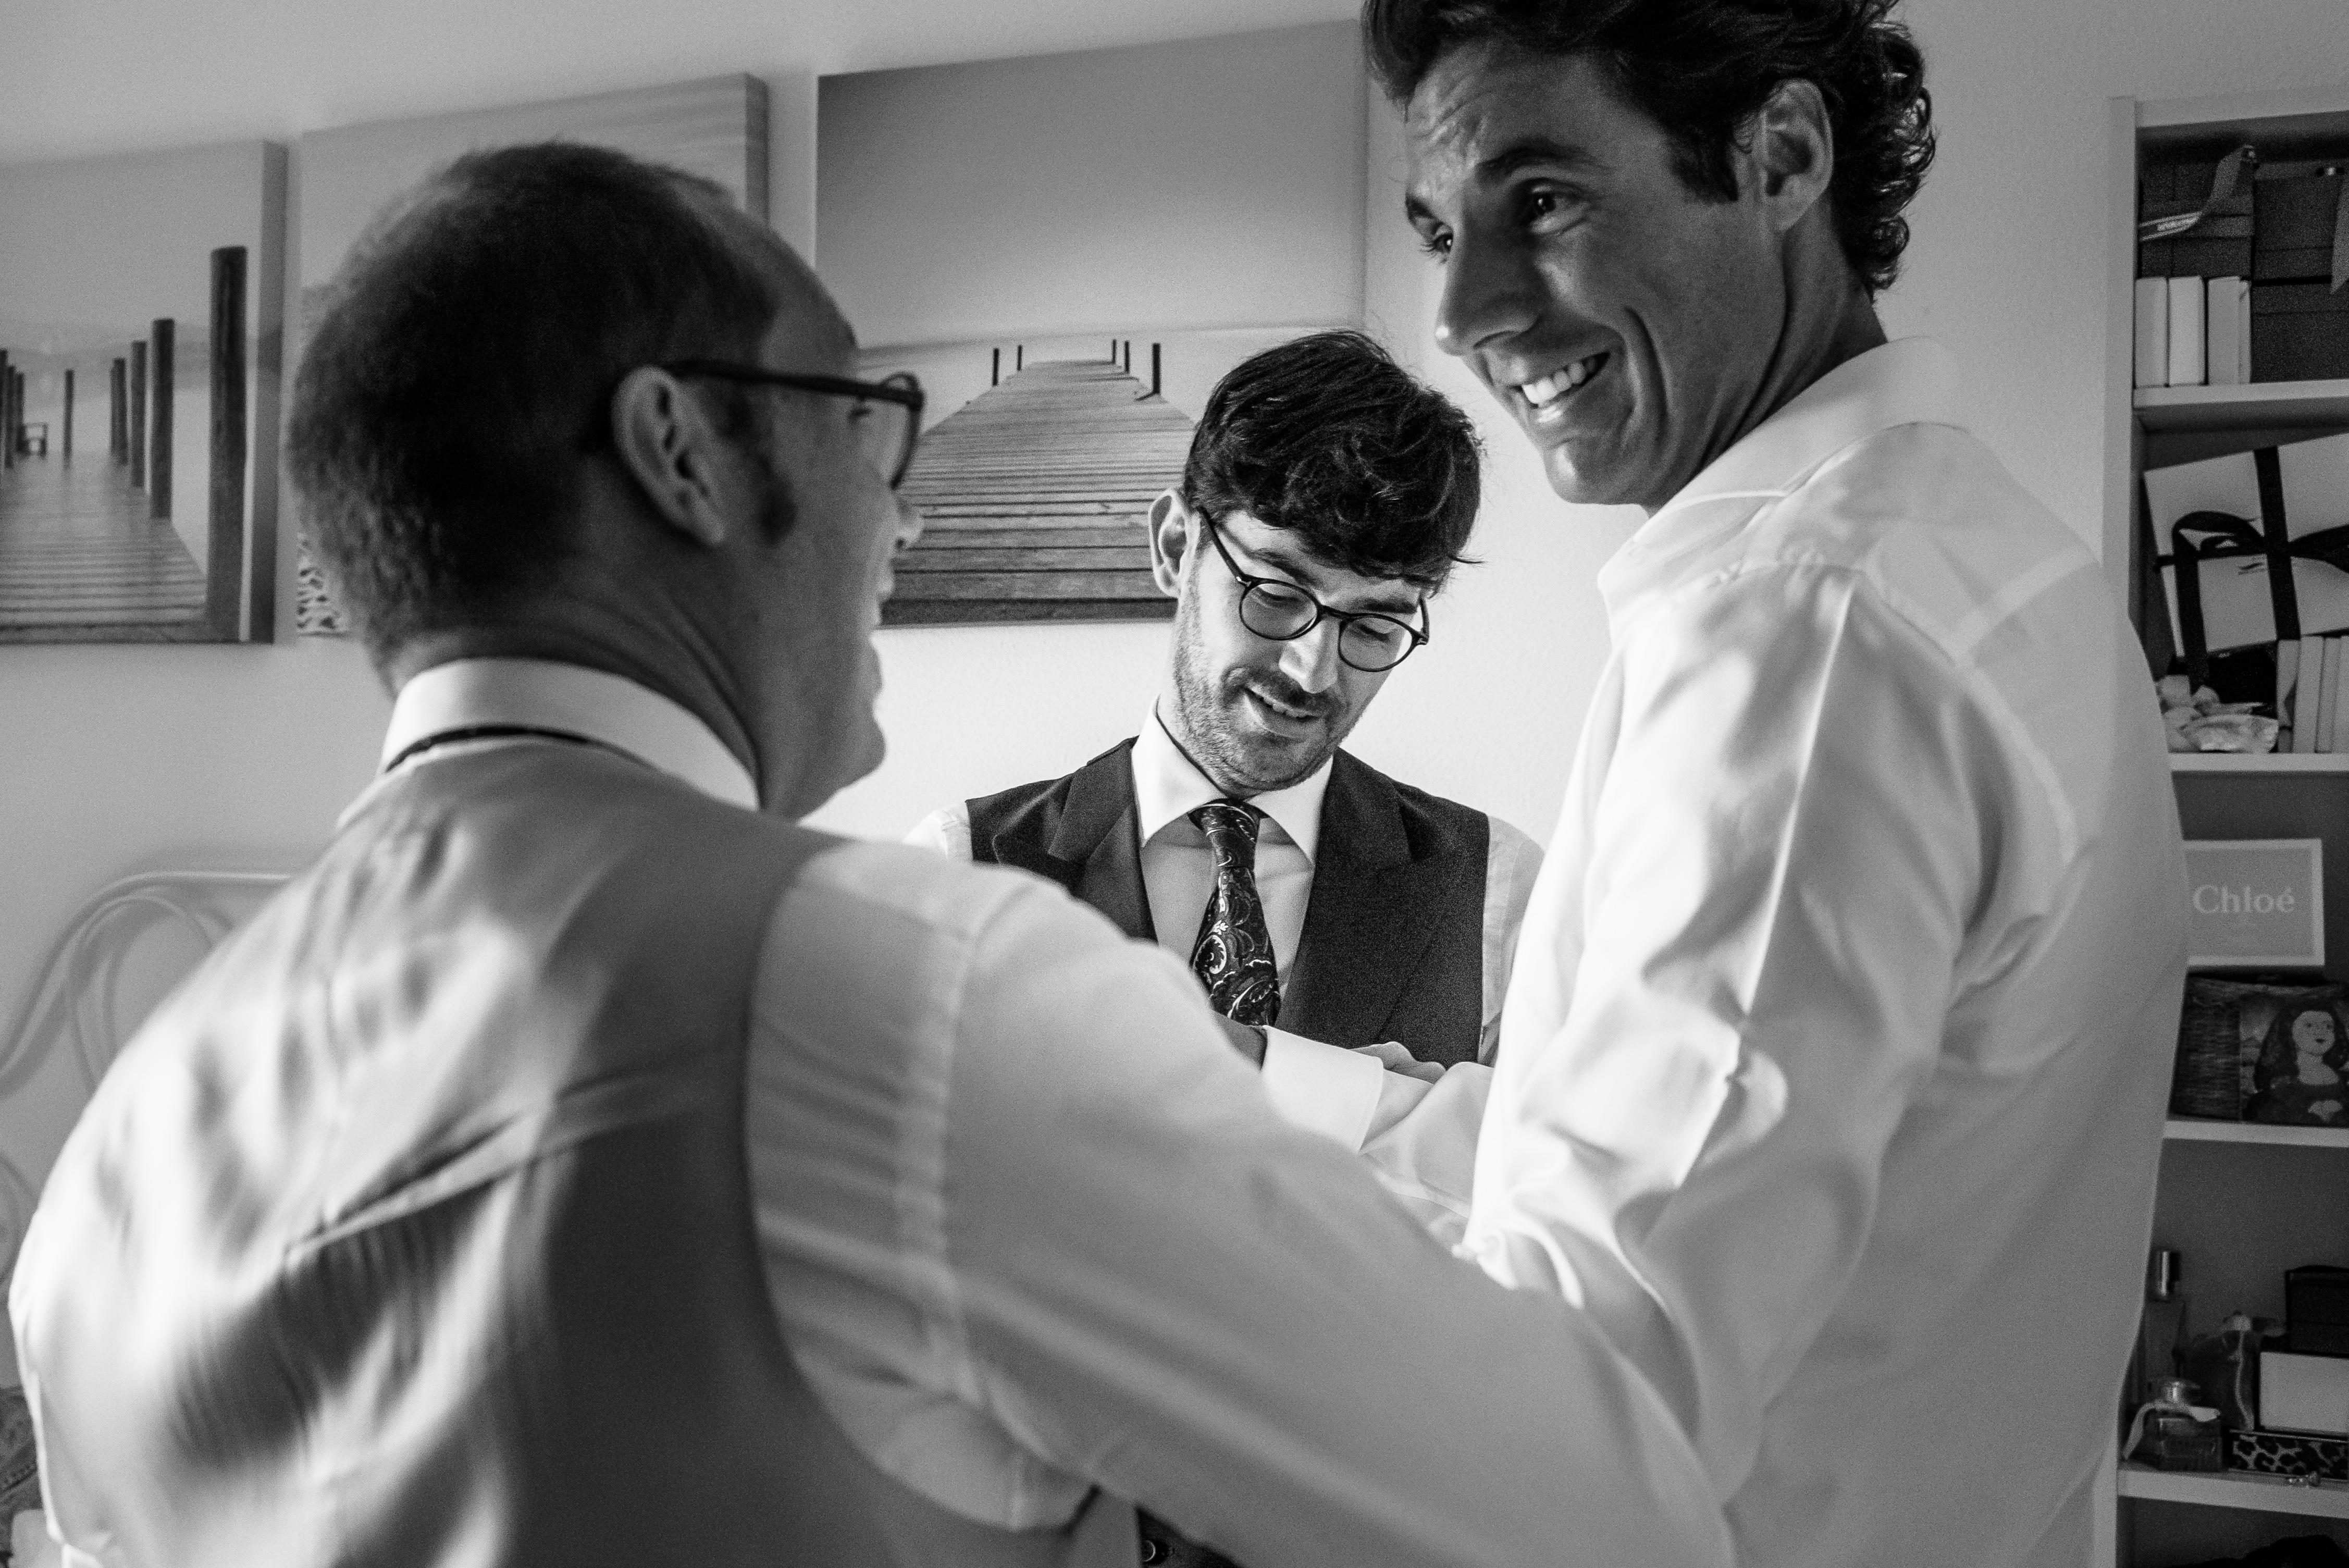 mandarina weddig, fotografos de boda, fotografo boda soria, fotografo boda barcelona, fotografo boda Madrid, fotografo boda lerida, fotografo boda Huesca_26